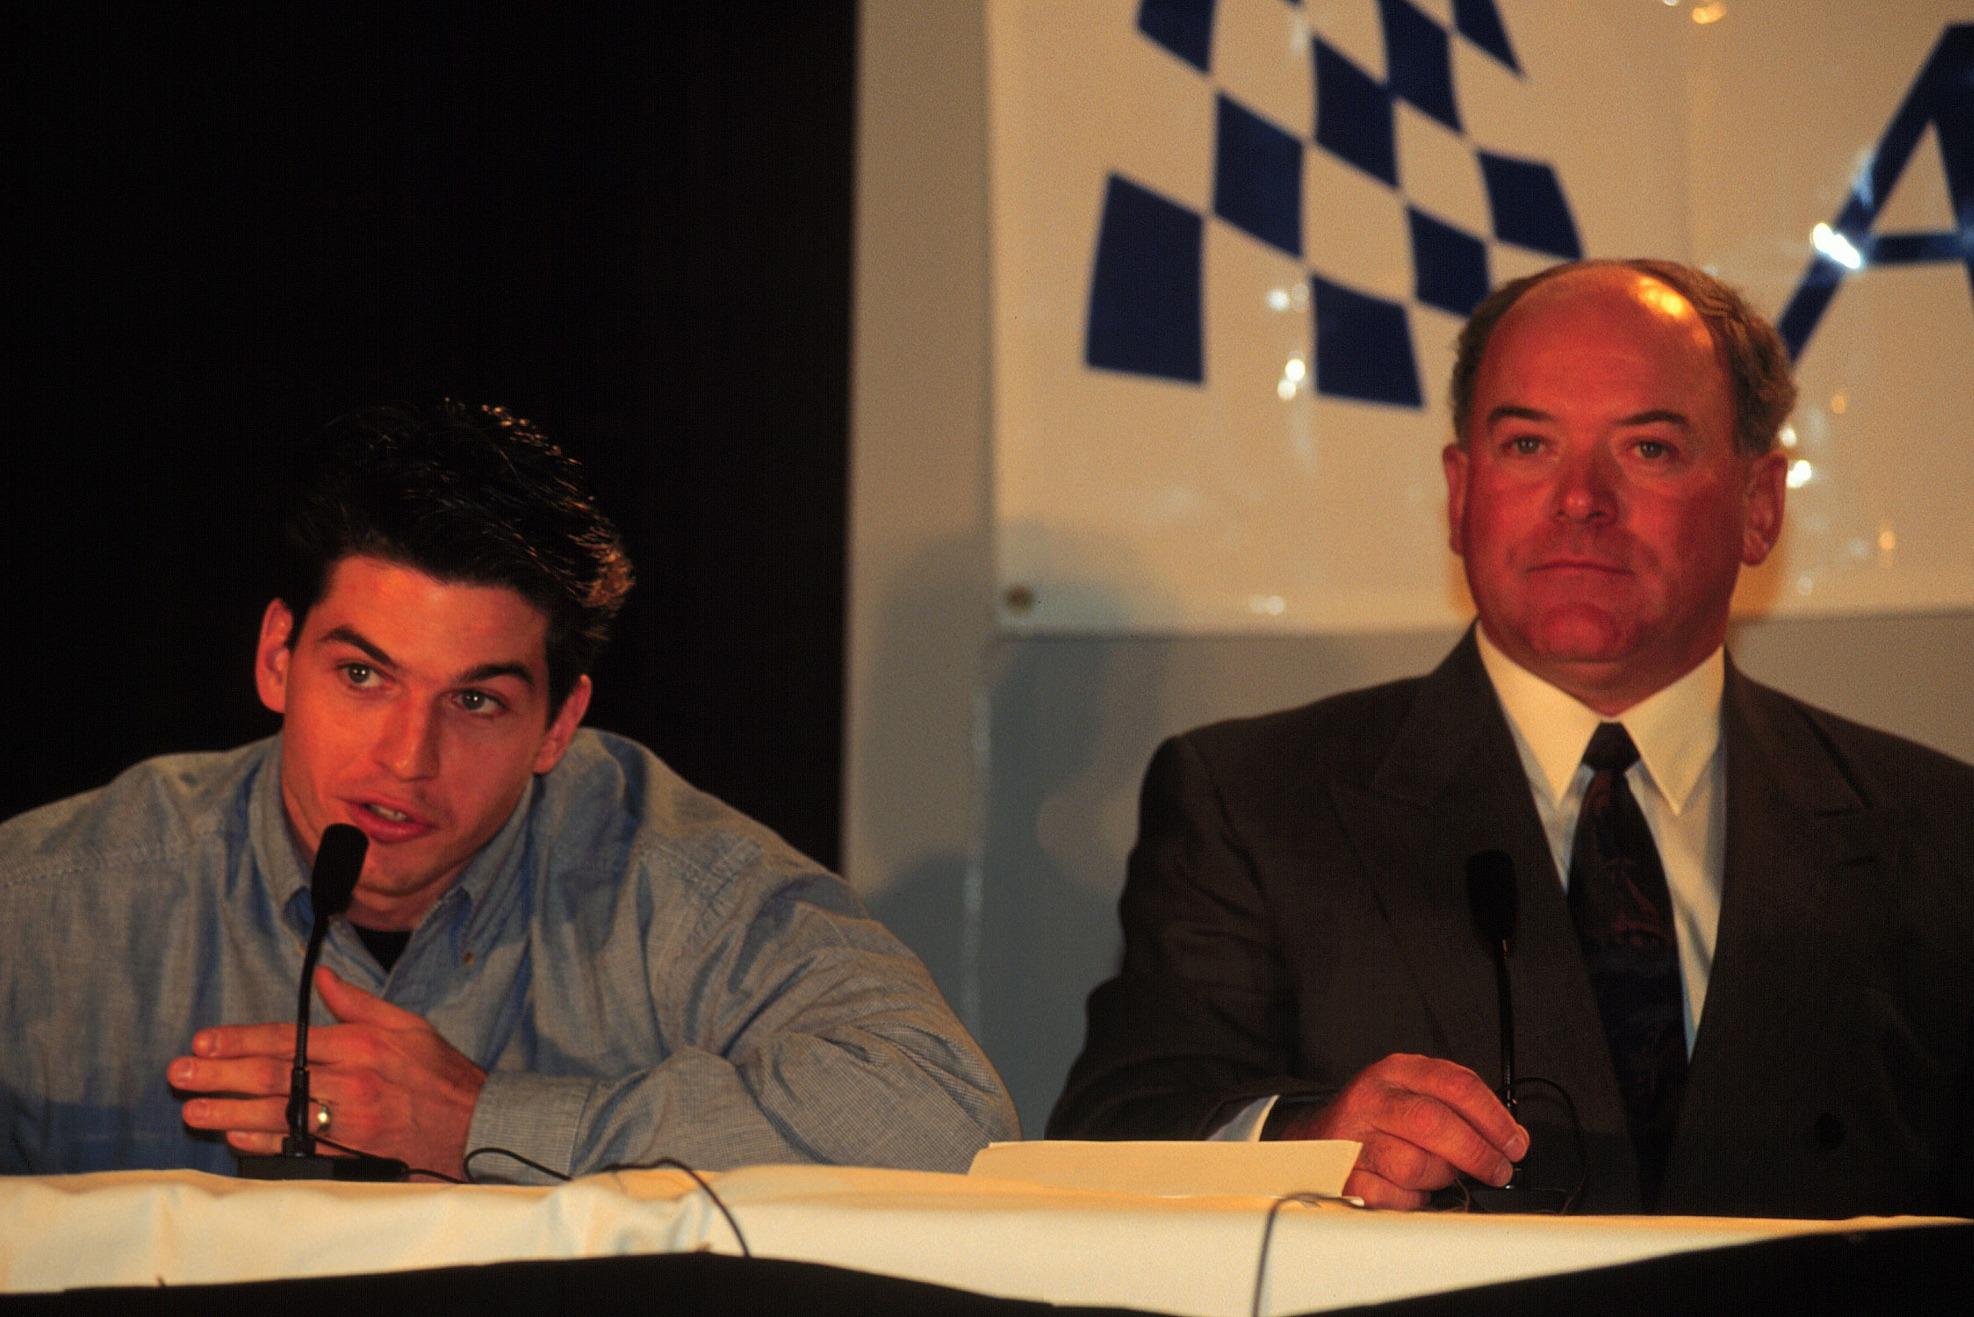 Carpentier beat established international stars to Bettenhausen Indycar seat for 1997